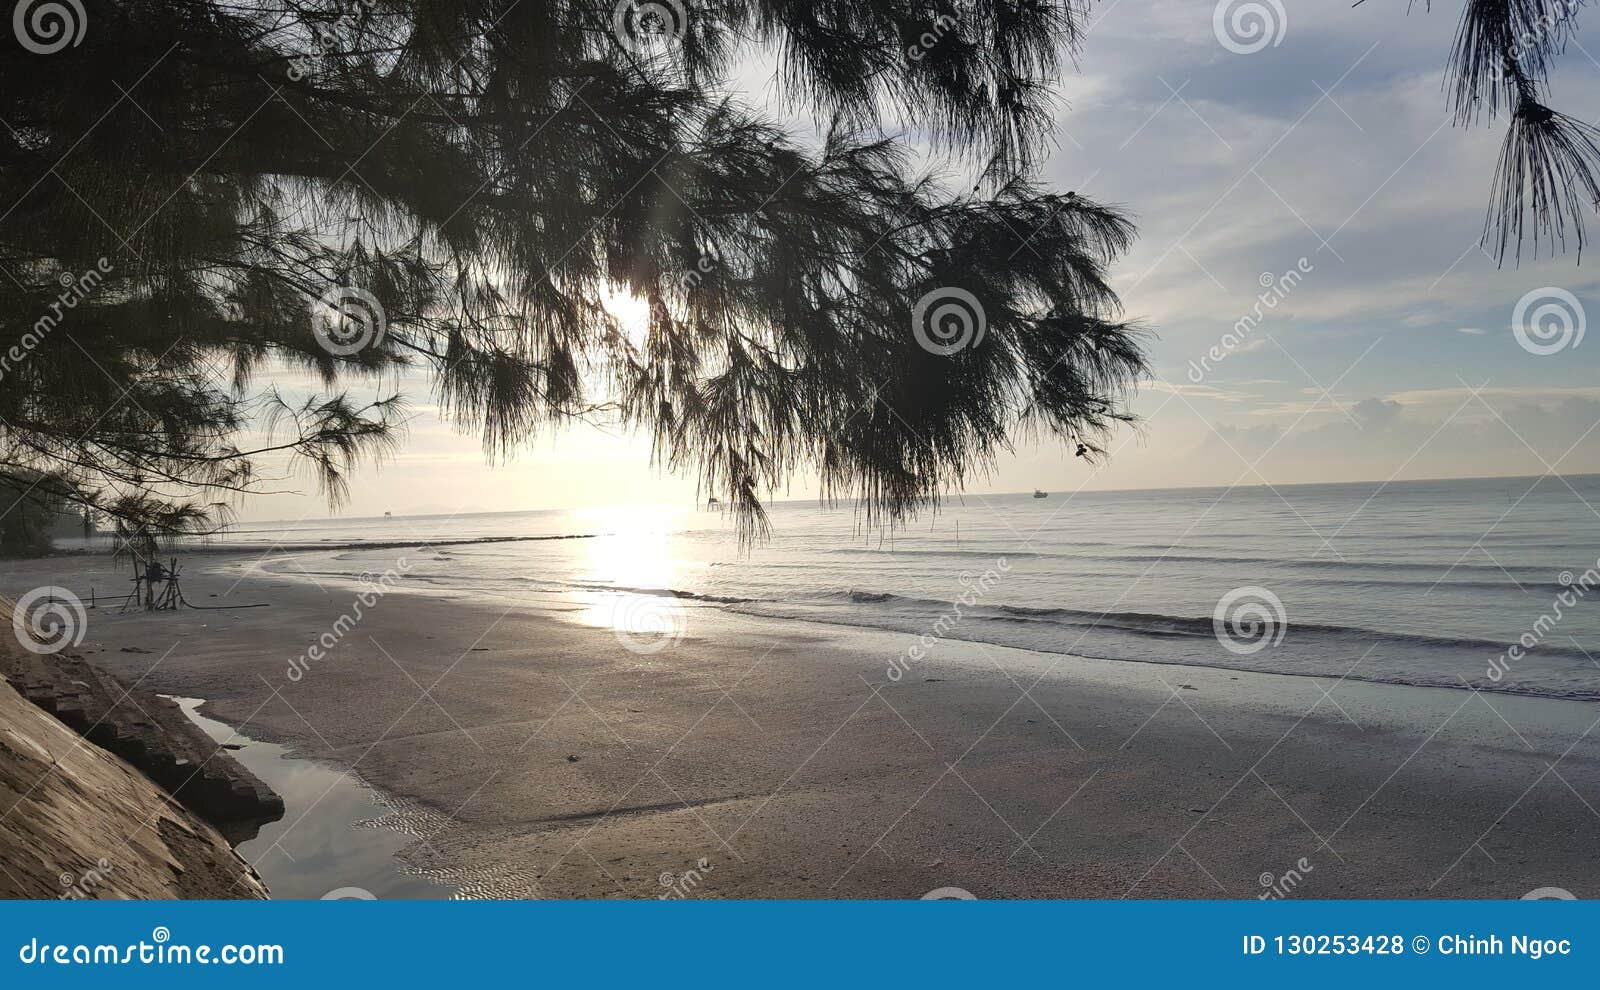 Sunshine at Can Gio Sea